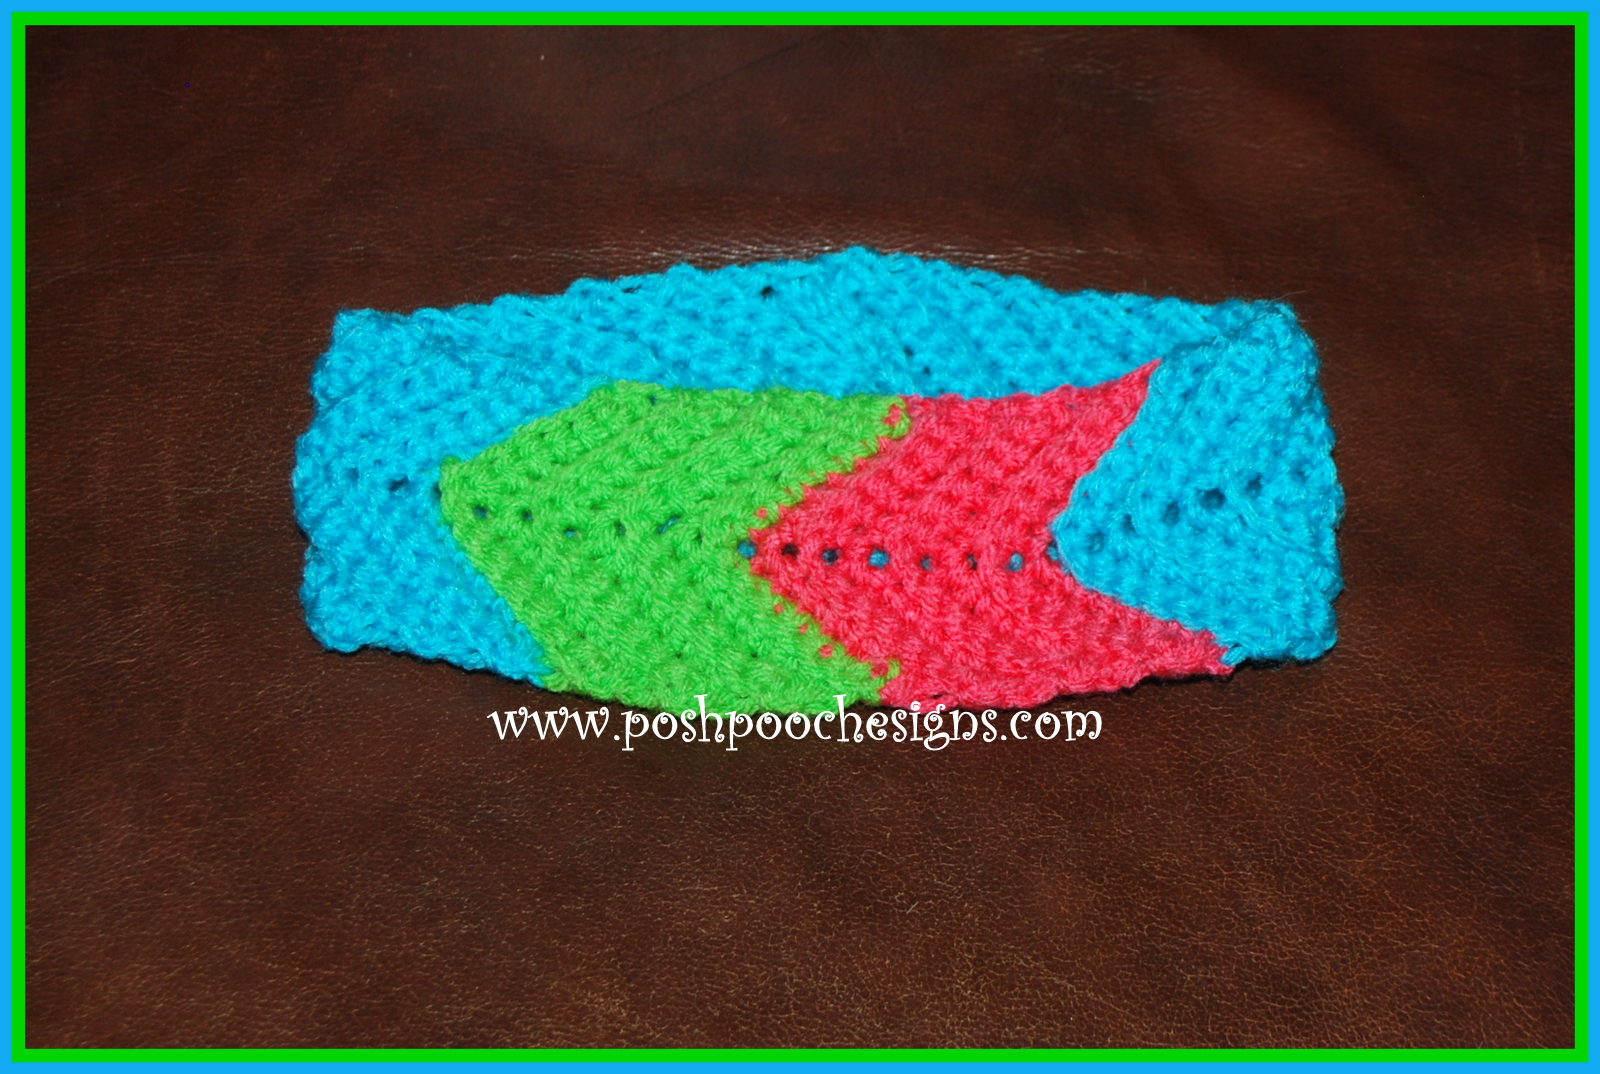 Free Crochet Chevron Ear Warmer Pattern : Posh Pooch Designs Dog Clothes: Chevron Headband Crochet ...